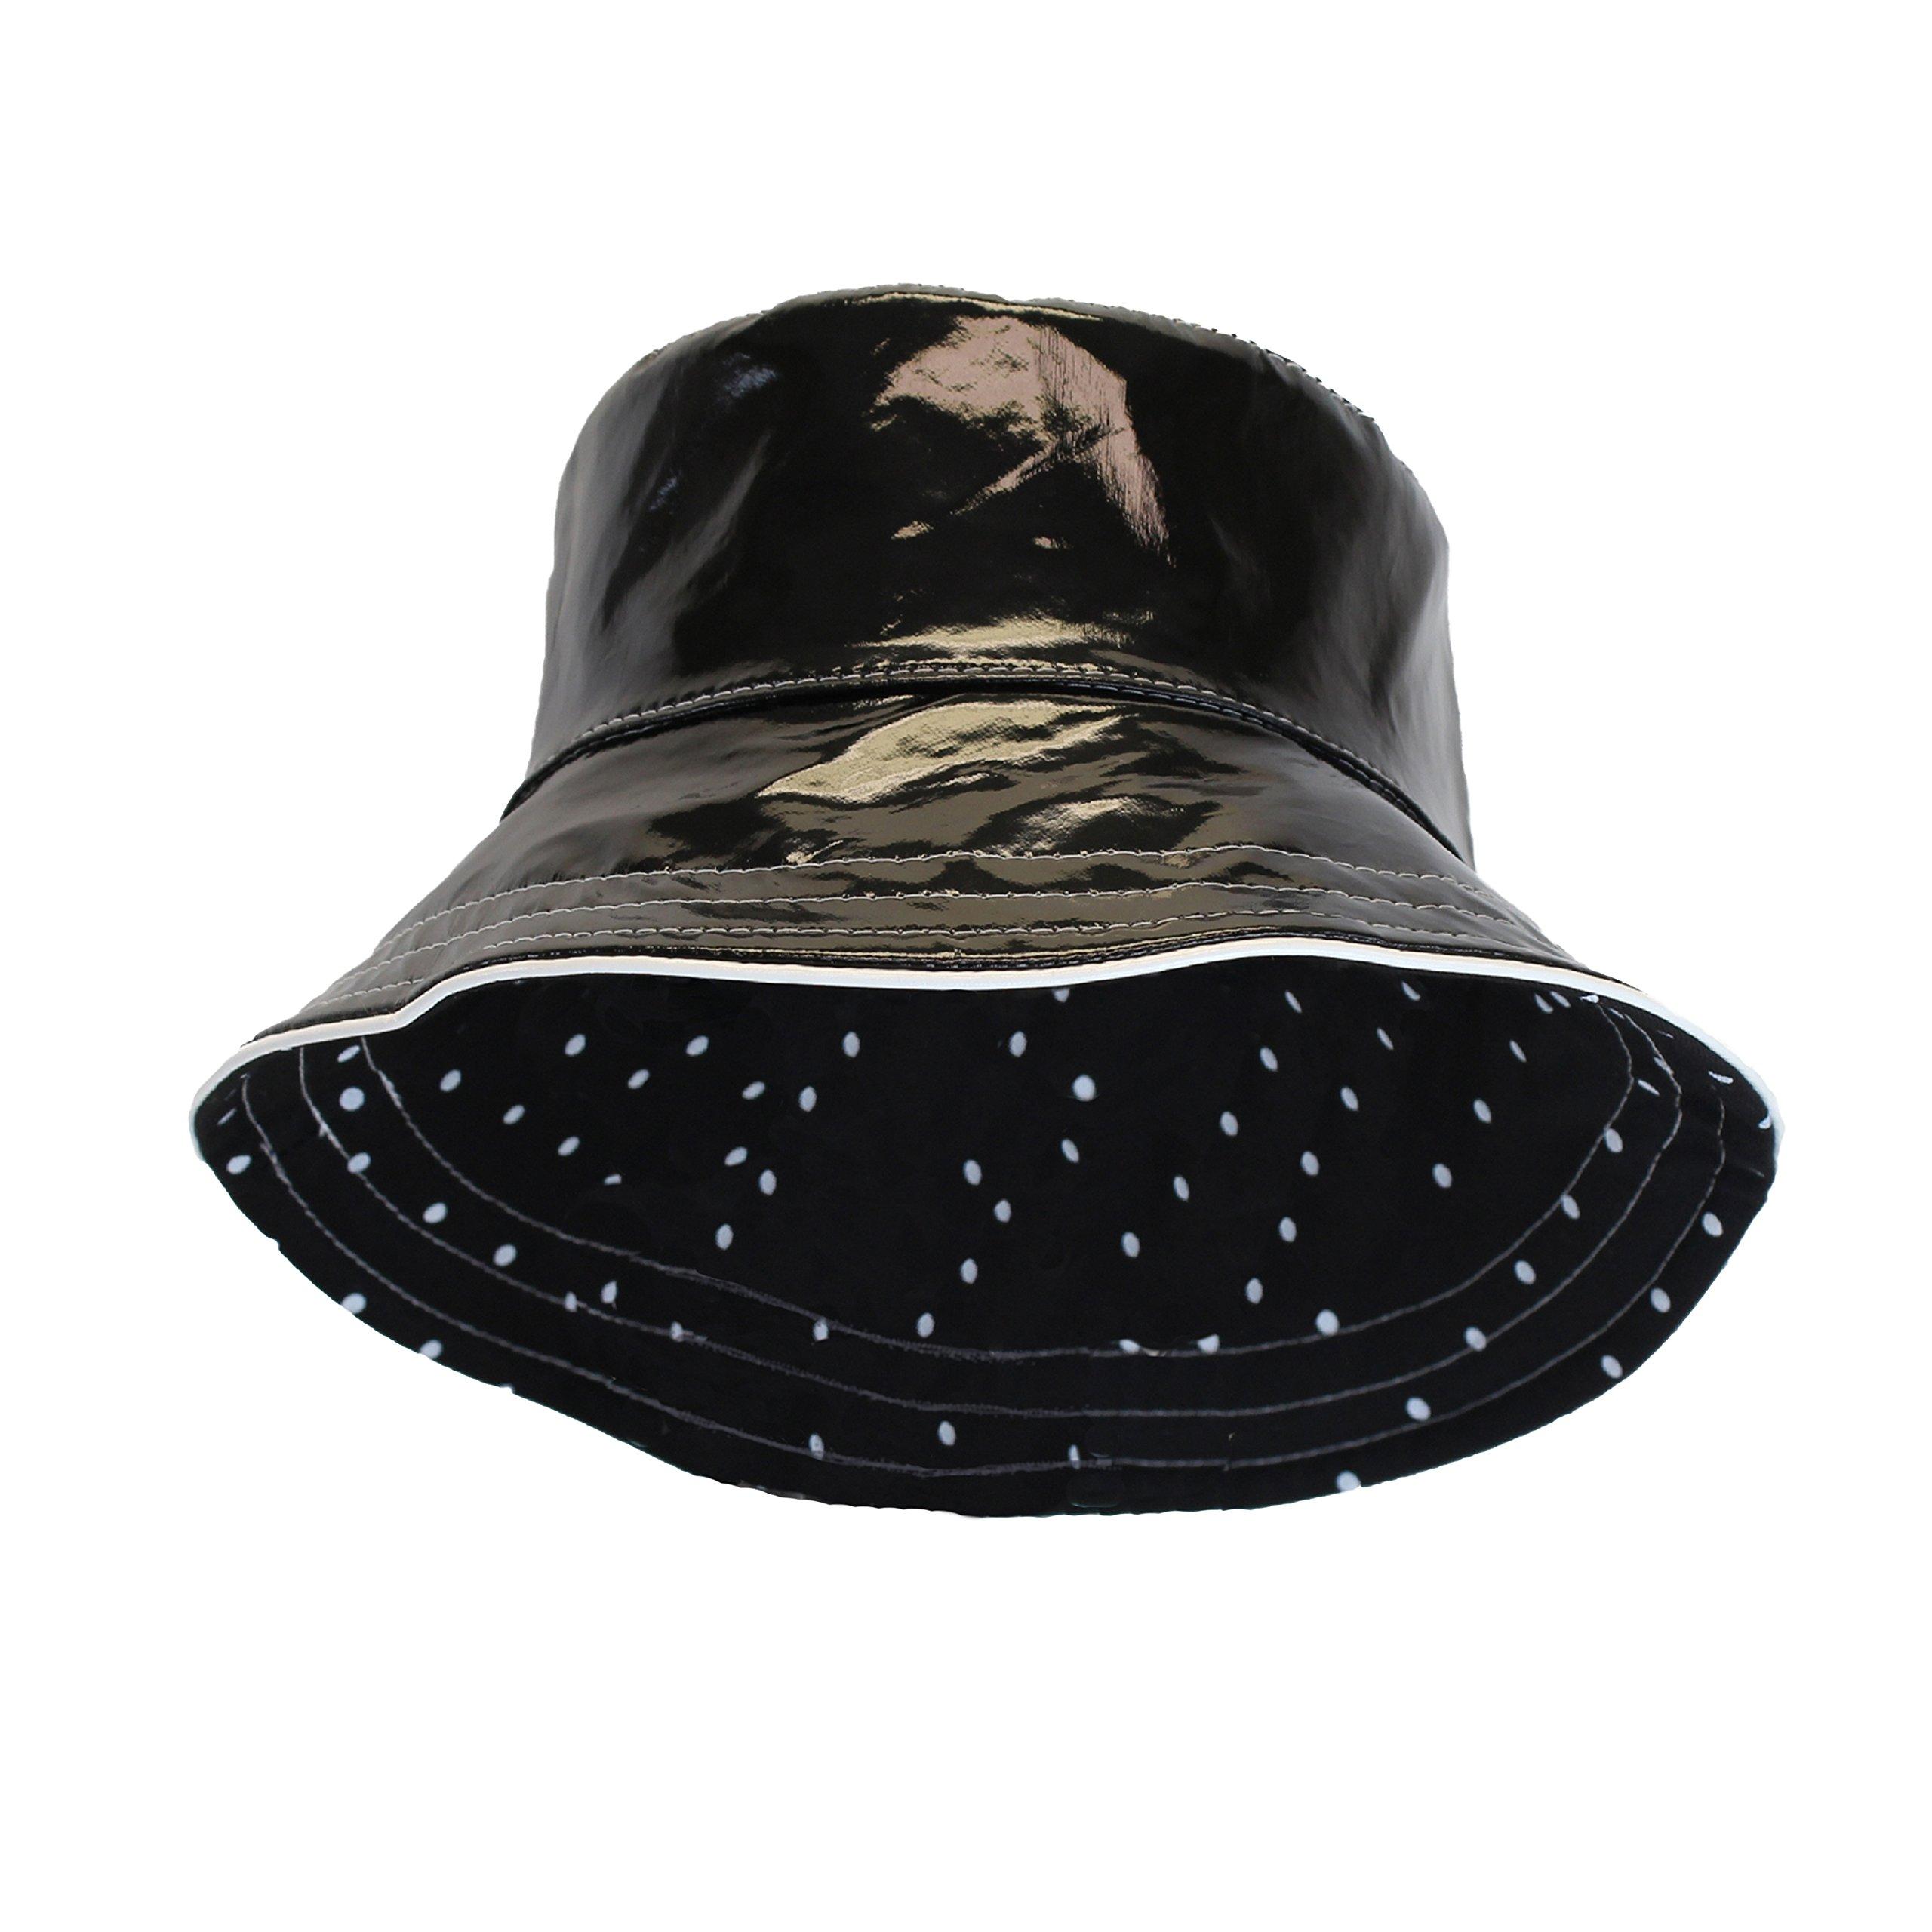 Black Patent Polka Dot Reversible Waterproof Bucket Rain Hat, Foldable, One Size